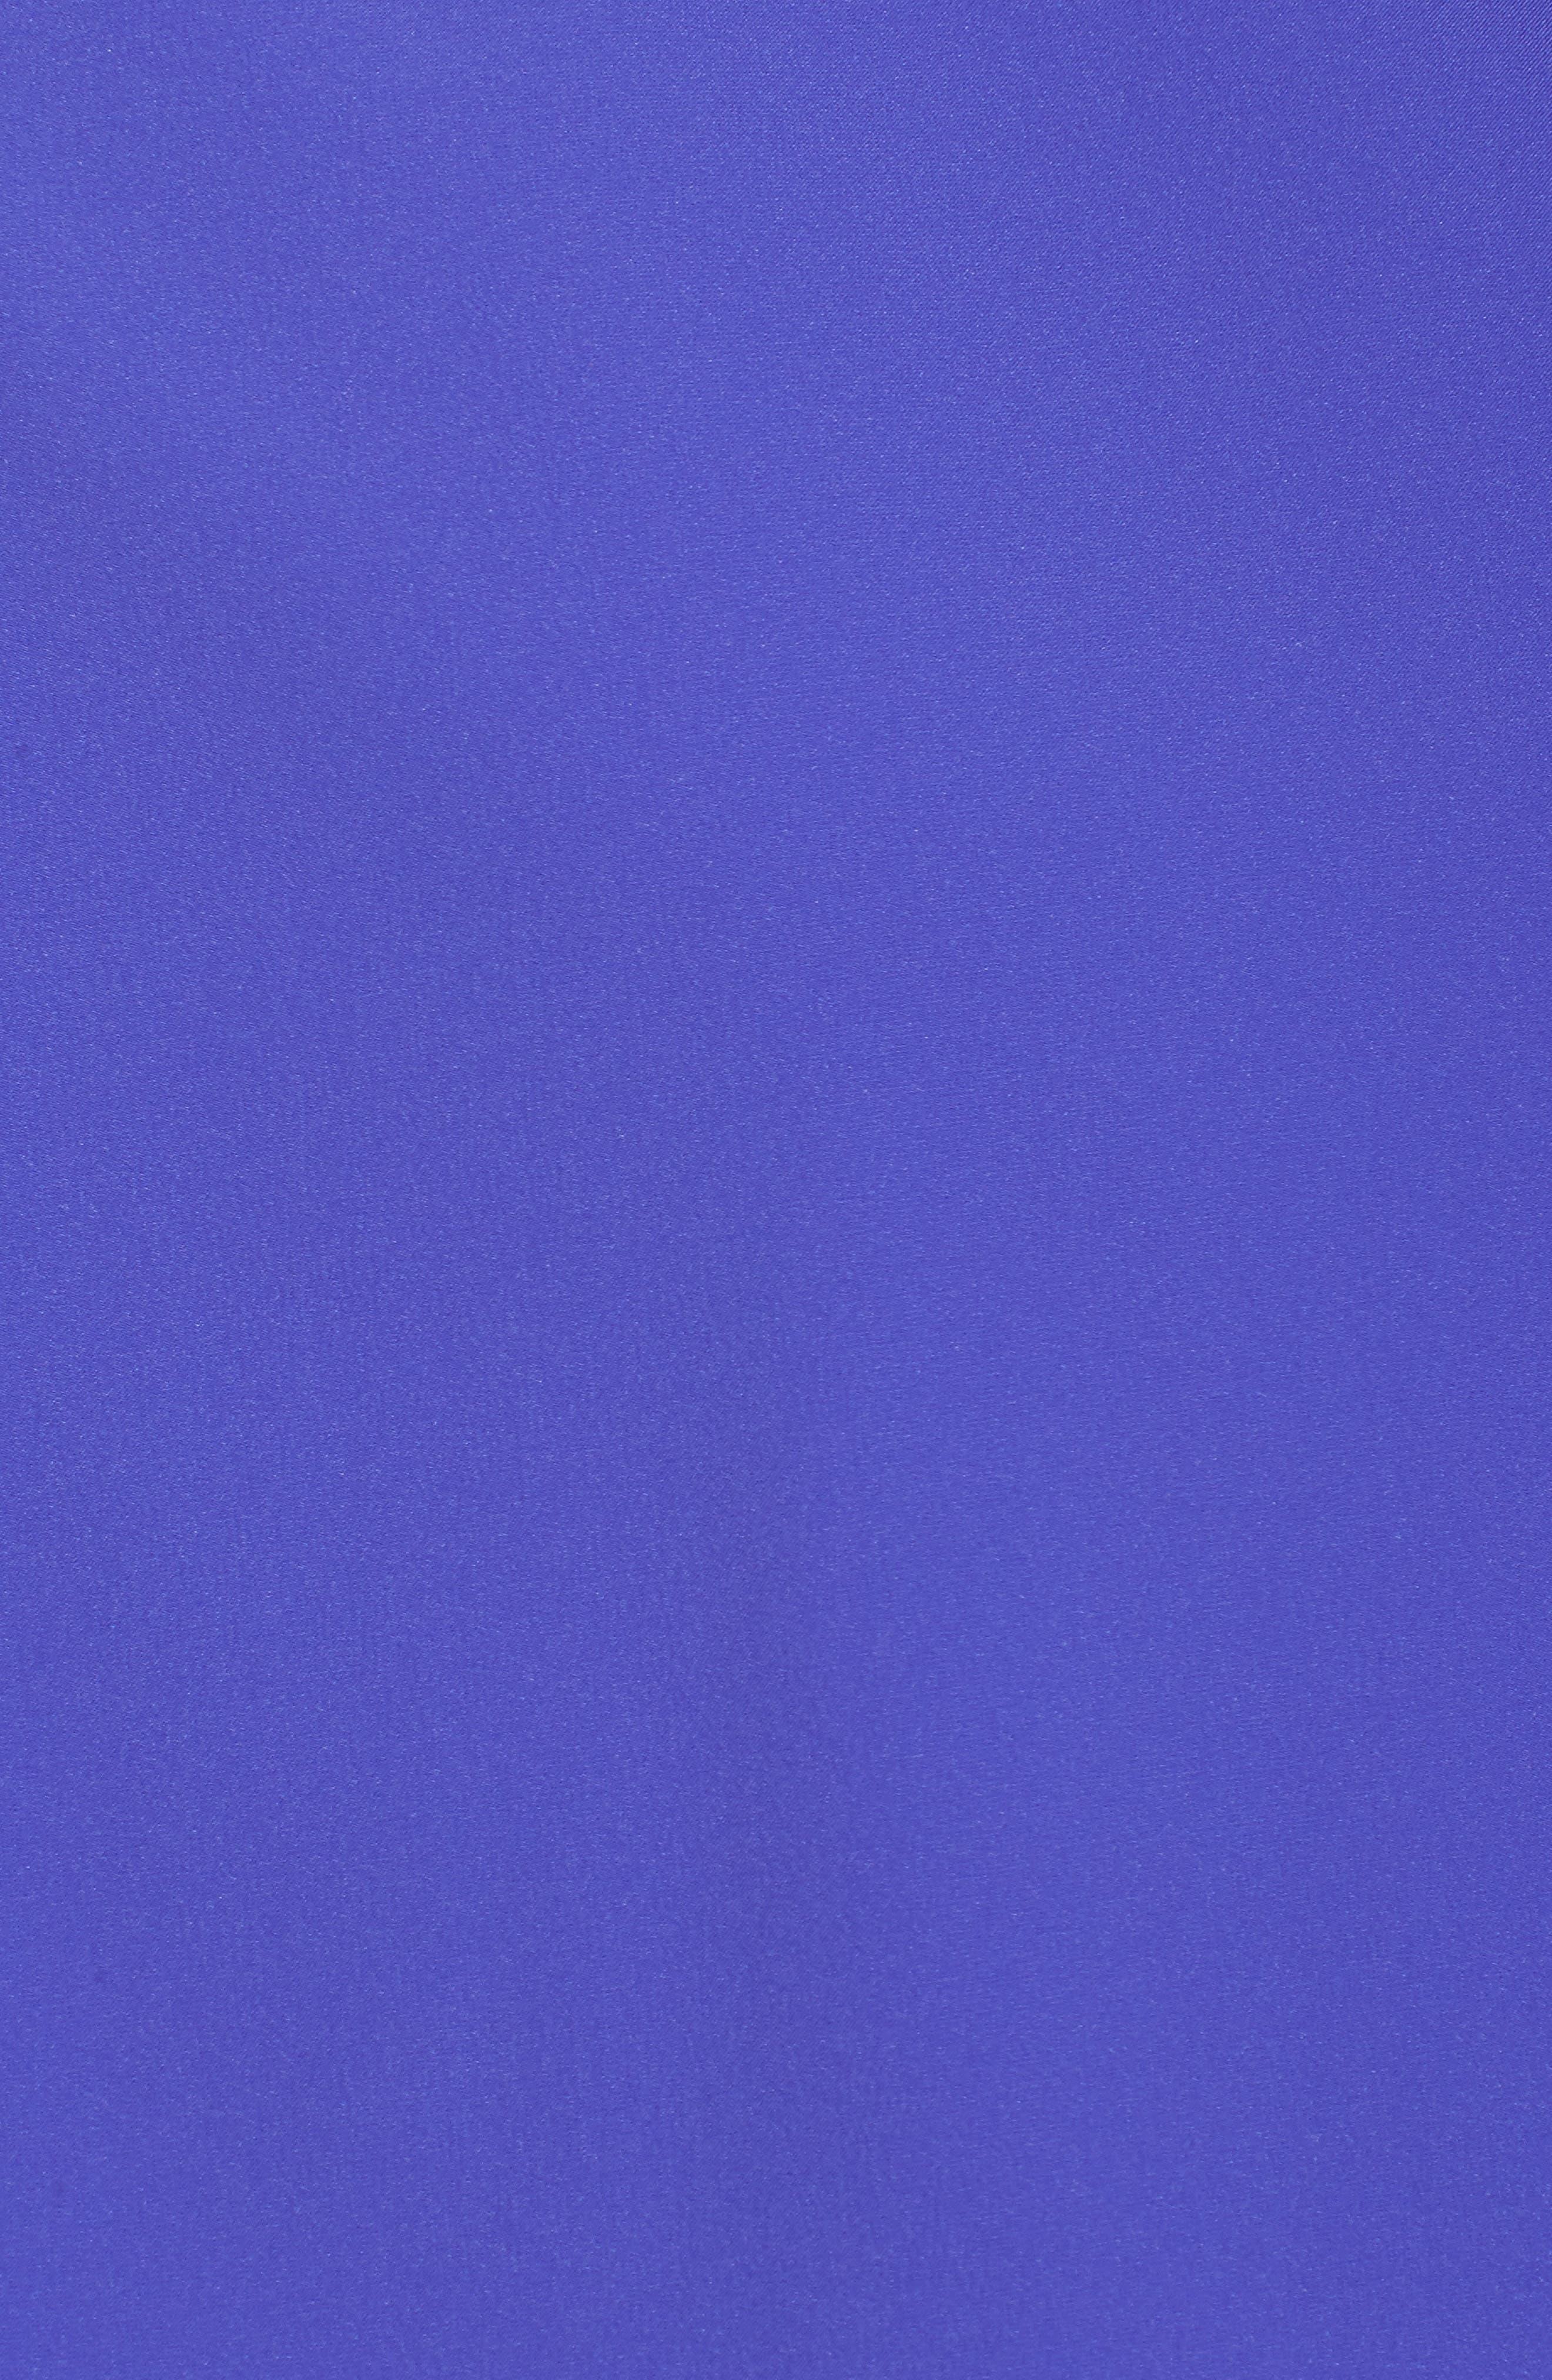 Sportswear Tech Pack Women's Long Sleeve Top,                             Alternate thumbnail 6, color,                             PERSIAN VIOLET/ BURGUNDY ASH